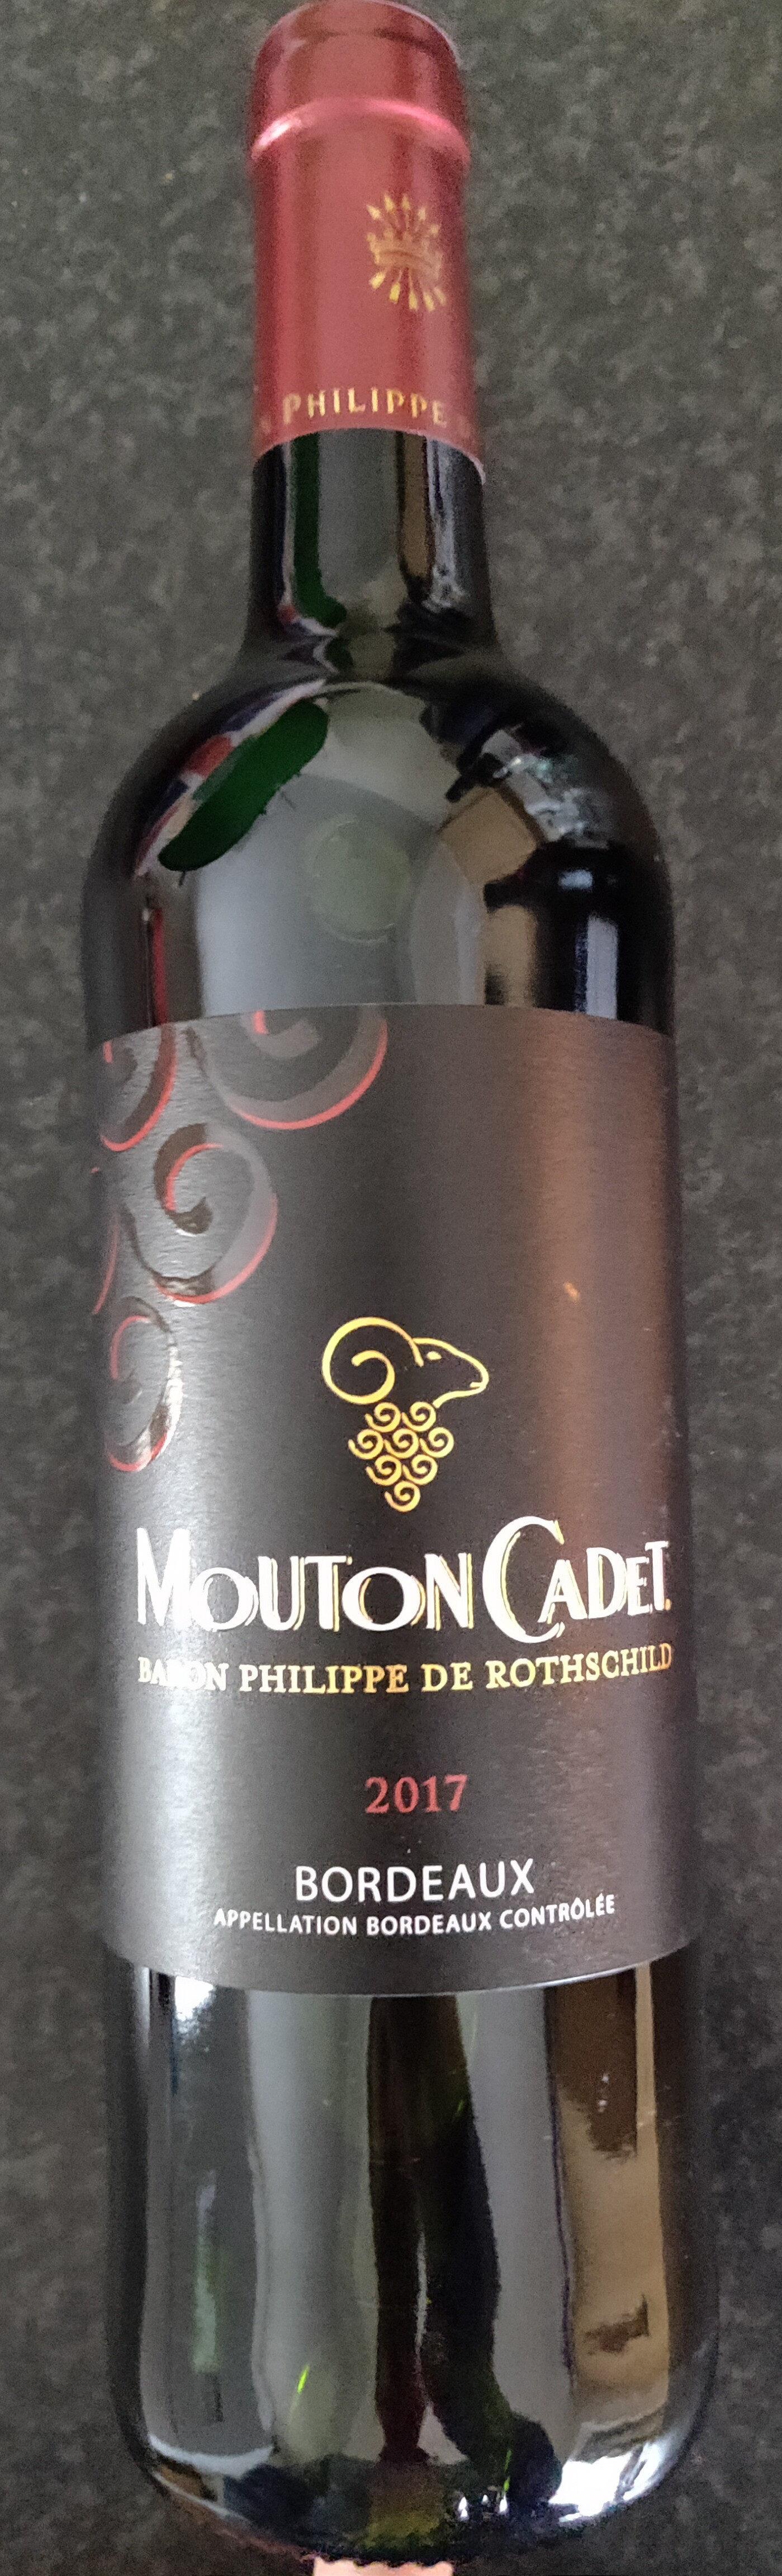 MOUTON CADET - Product - fr